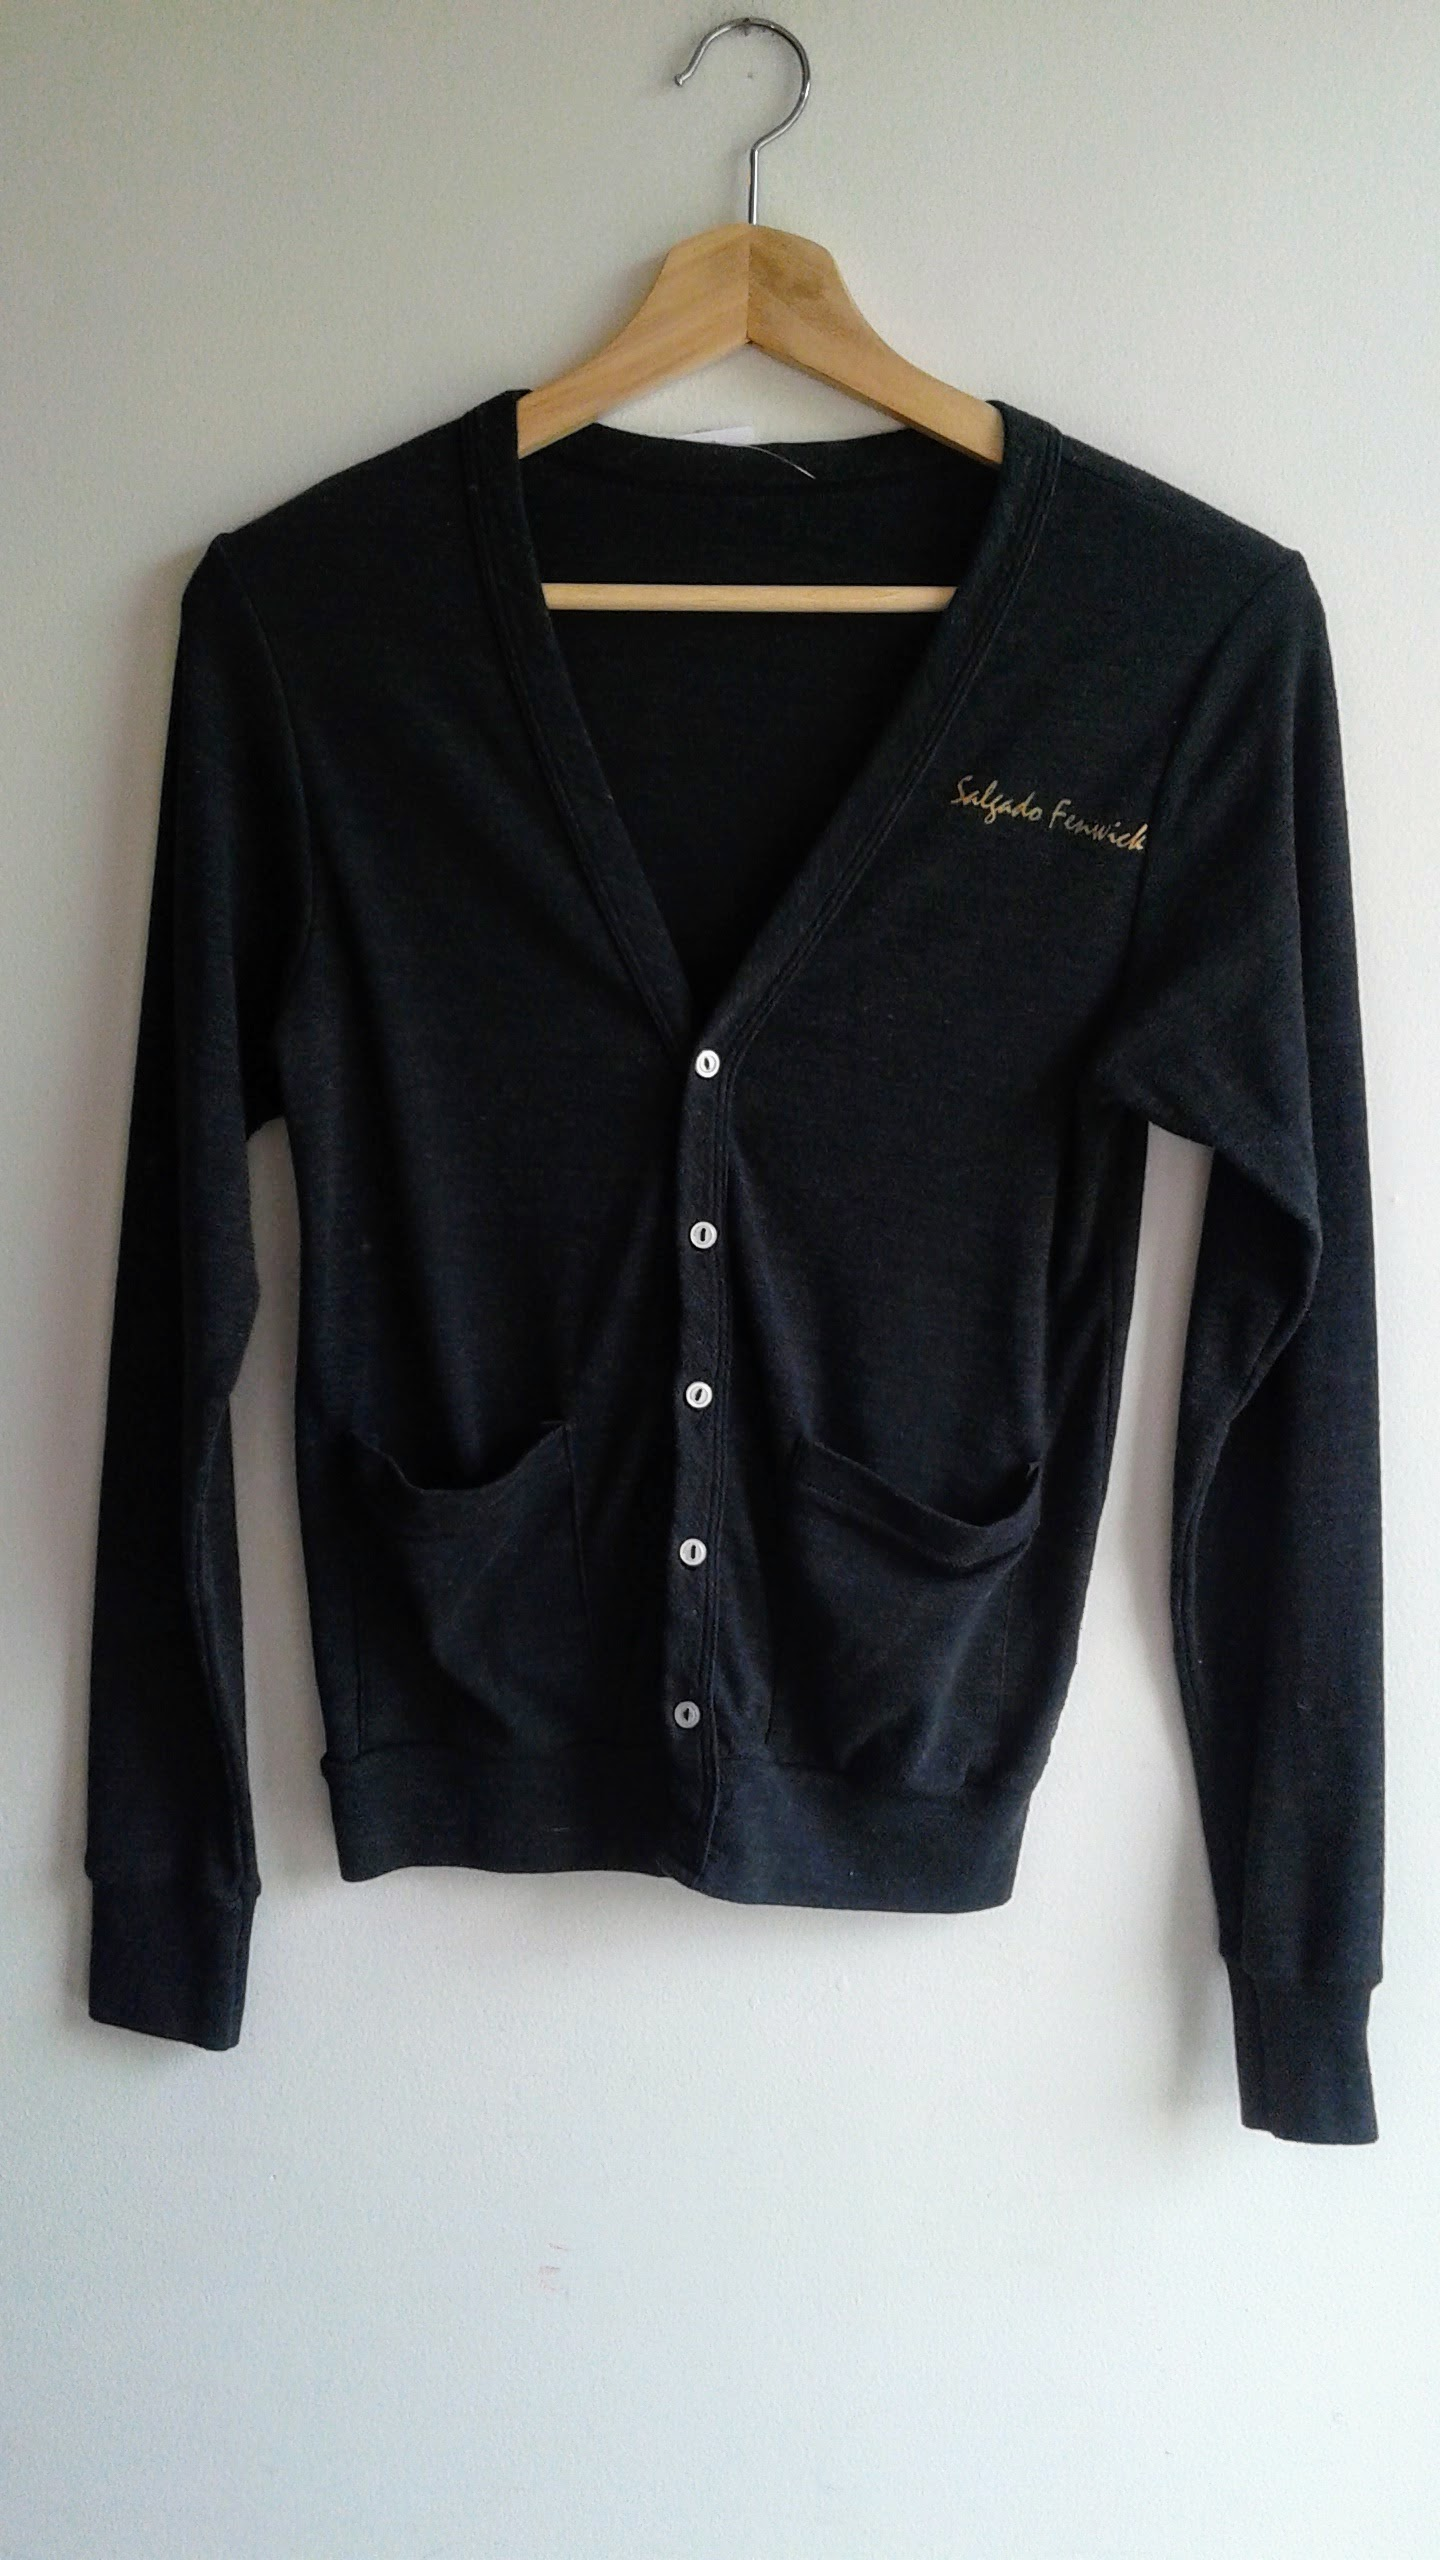 Salgado Fenwick cardigan; Size S, $30